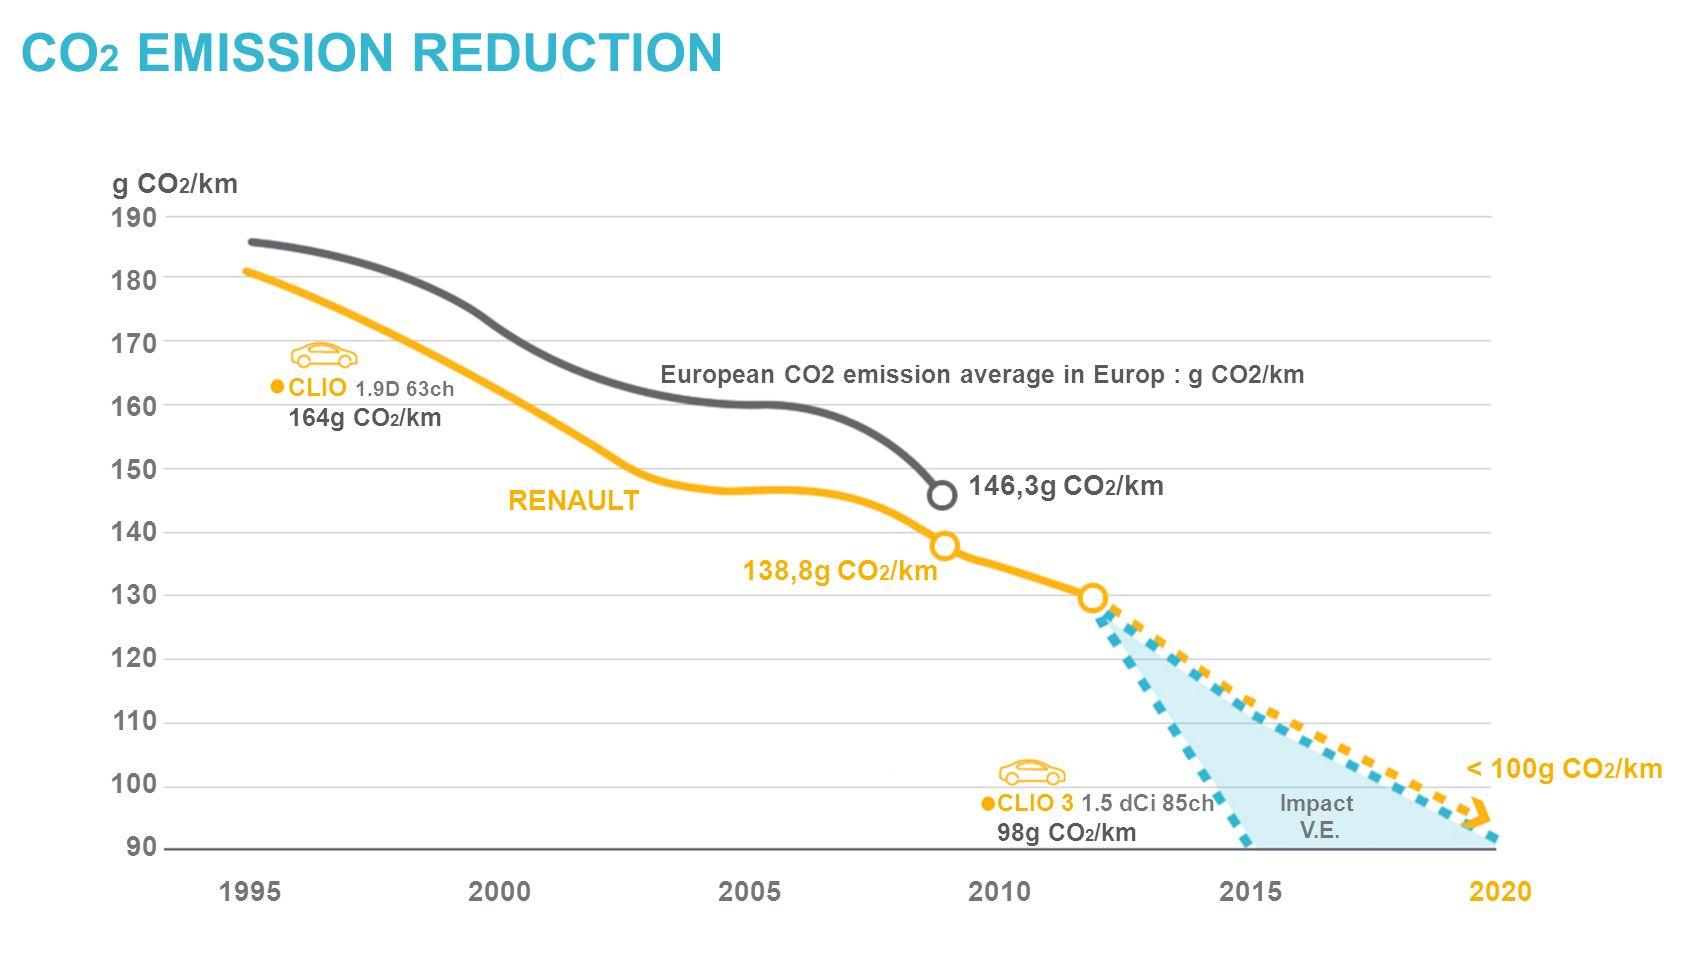 g CO 2 /km 190 180 170 160 150 140 130 120 110 100 90 199520002005201020152020 146,3g CO 2 /km 138,8g CO 2 /km RENAULT CLIO 1.9D 63ch 164g CO 2 /km < 100g CO 2 /km Impact V.E.